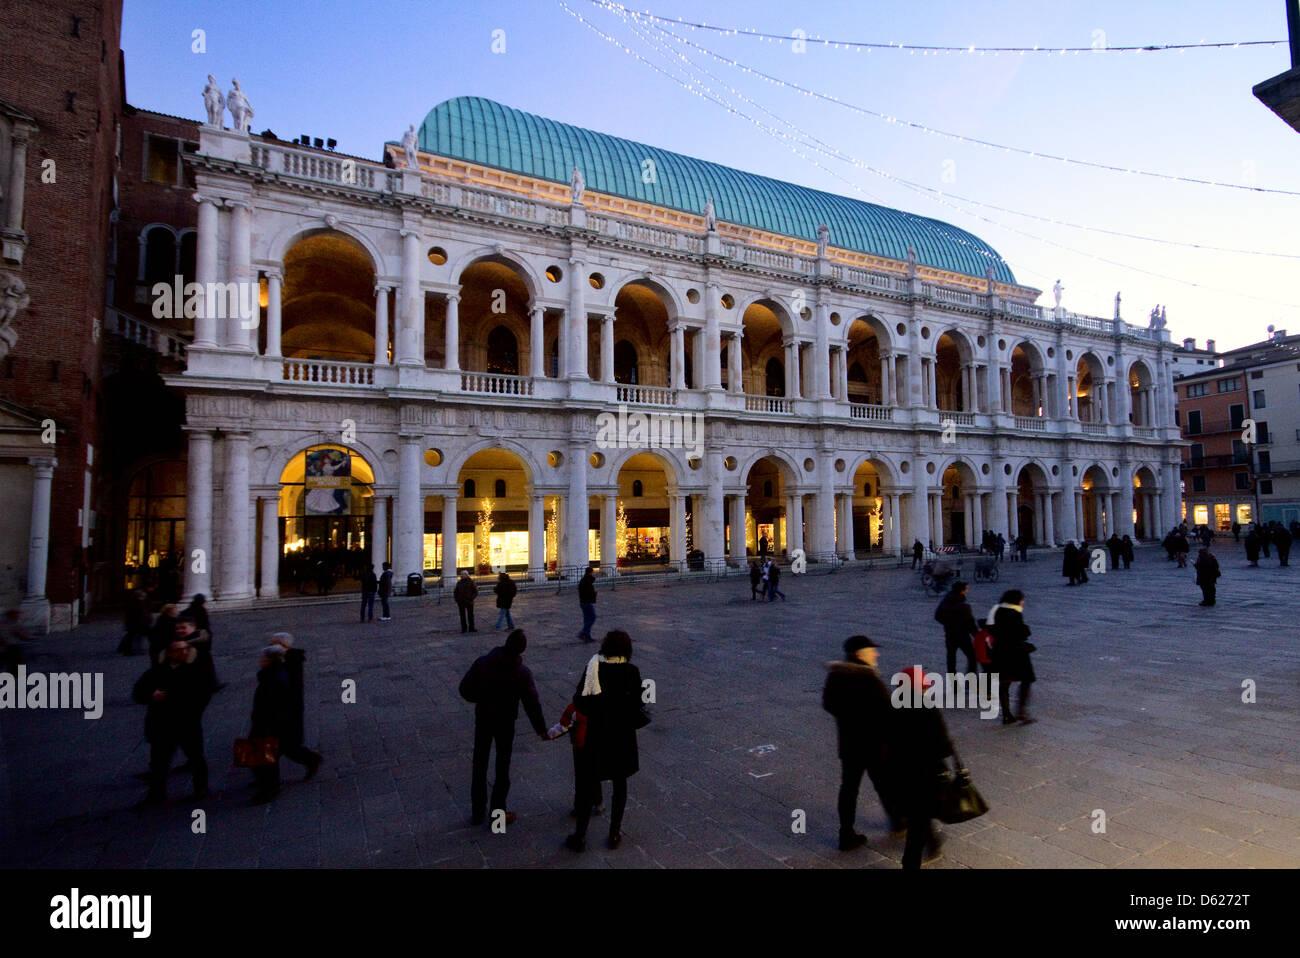 Europe; Italy; Italian; Vicenza; North; Veneto; Unesco; Palladio; People; Square; Basilica; Palladiana; Night; Lights; - Stock Image